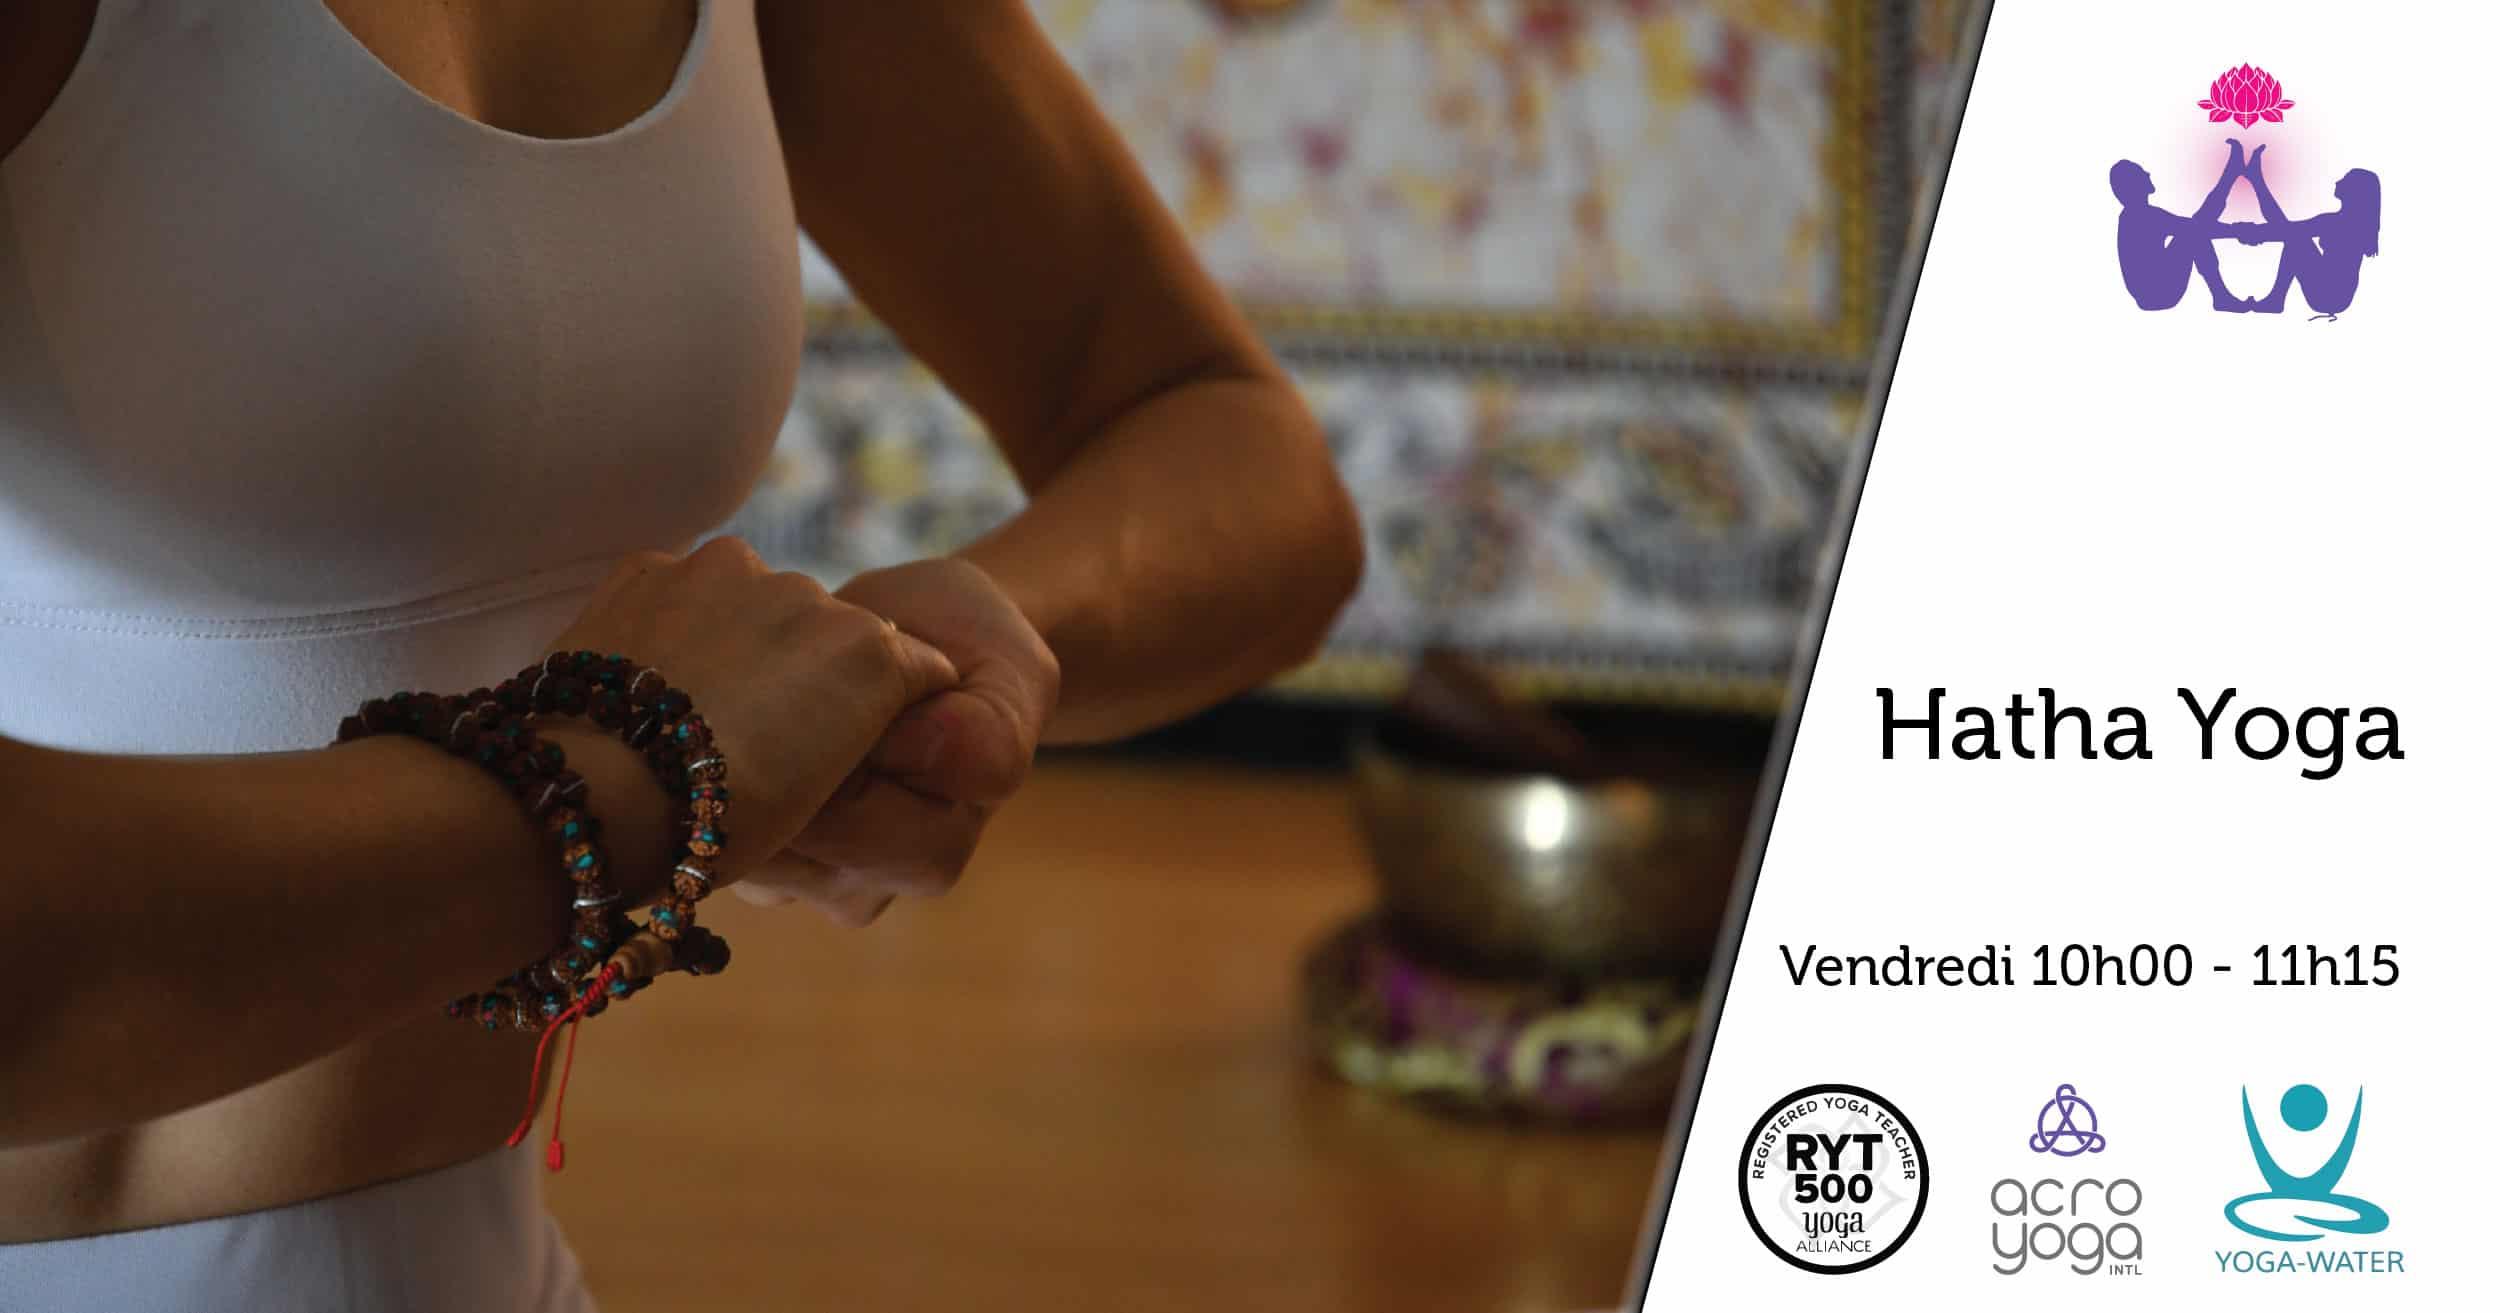 Hatha Yoga cours du vendredi